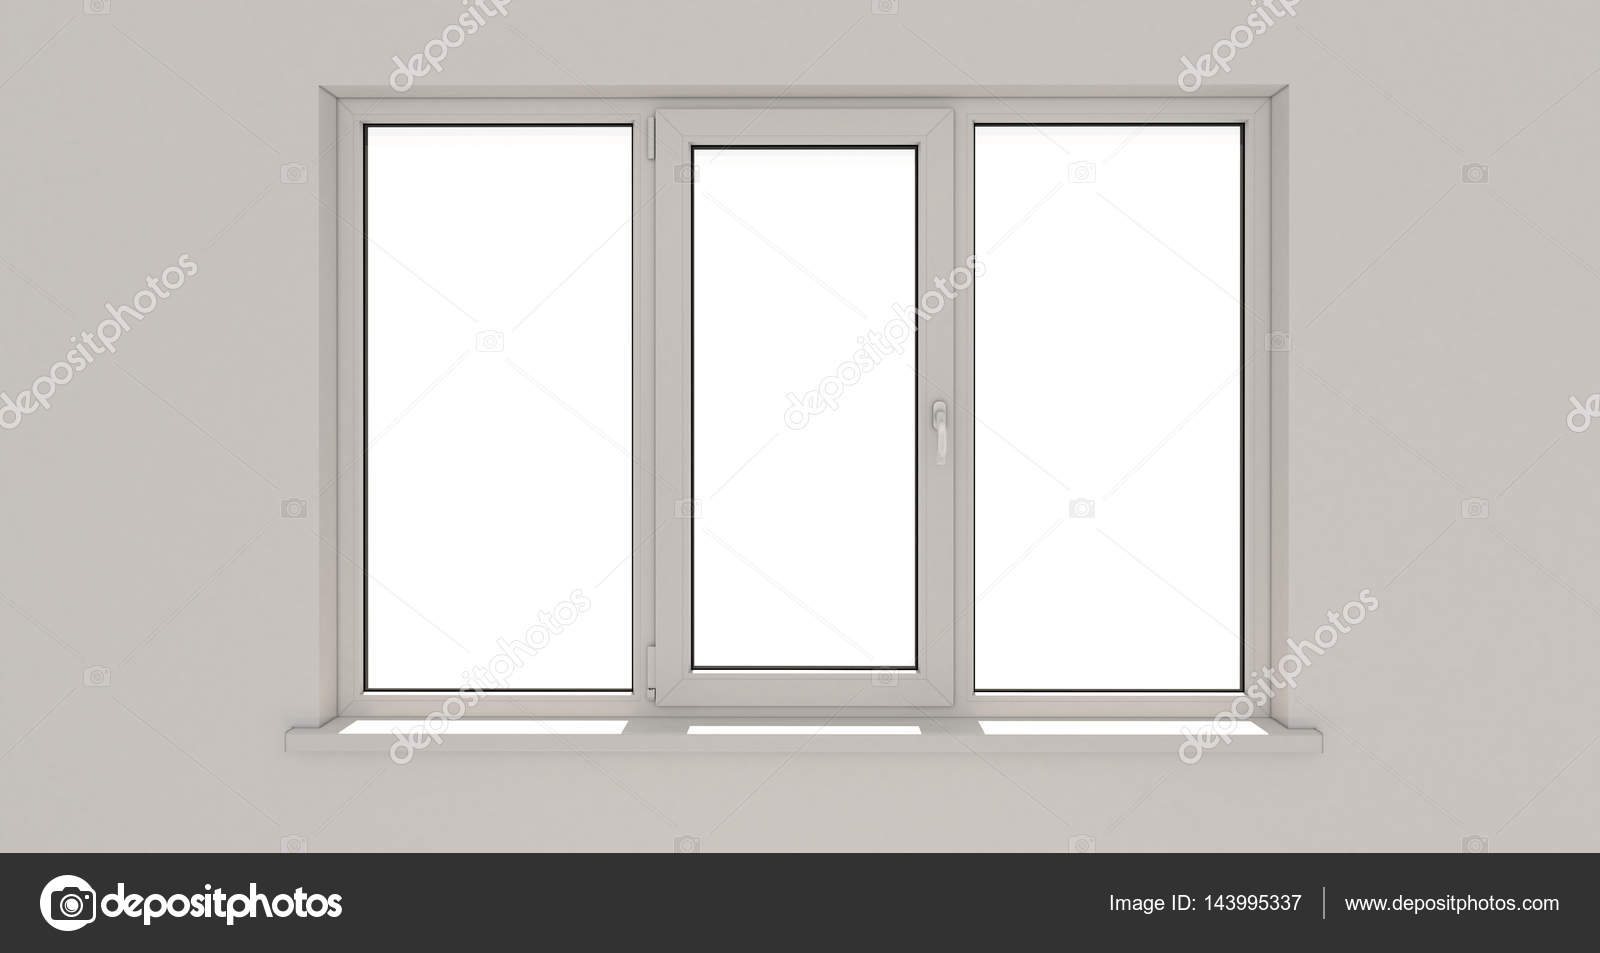 Fenster. Wand. Aluminium-Fenster. Weiße Fenster. PVC-Fenster ...